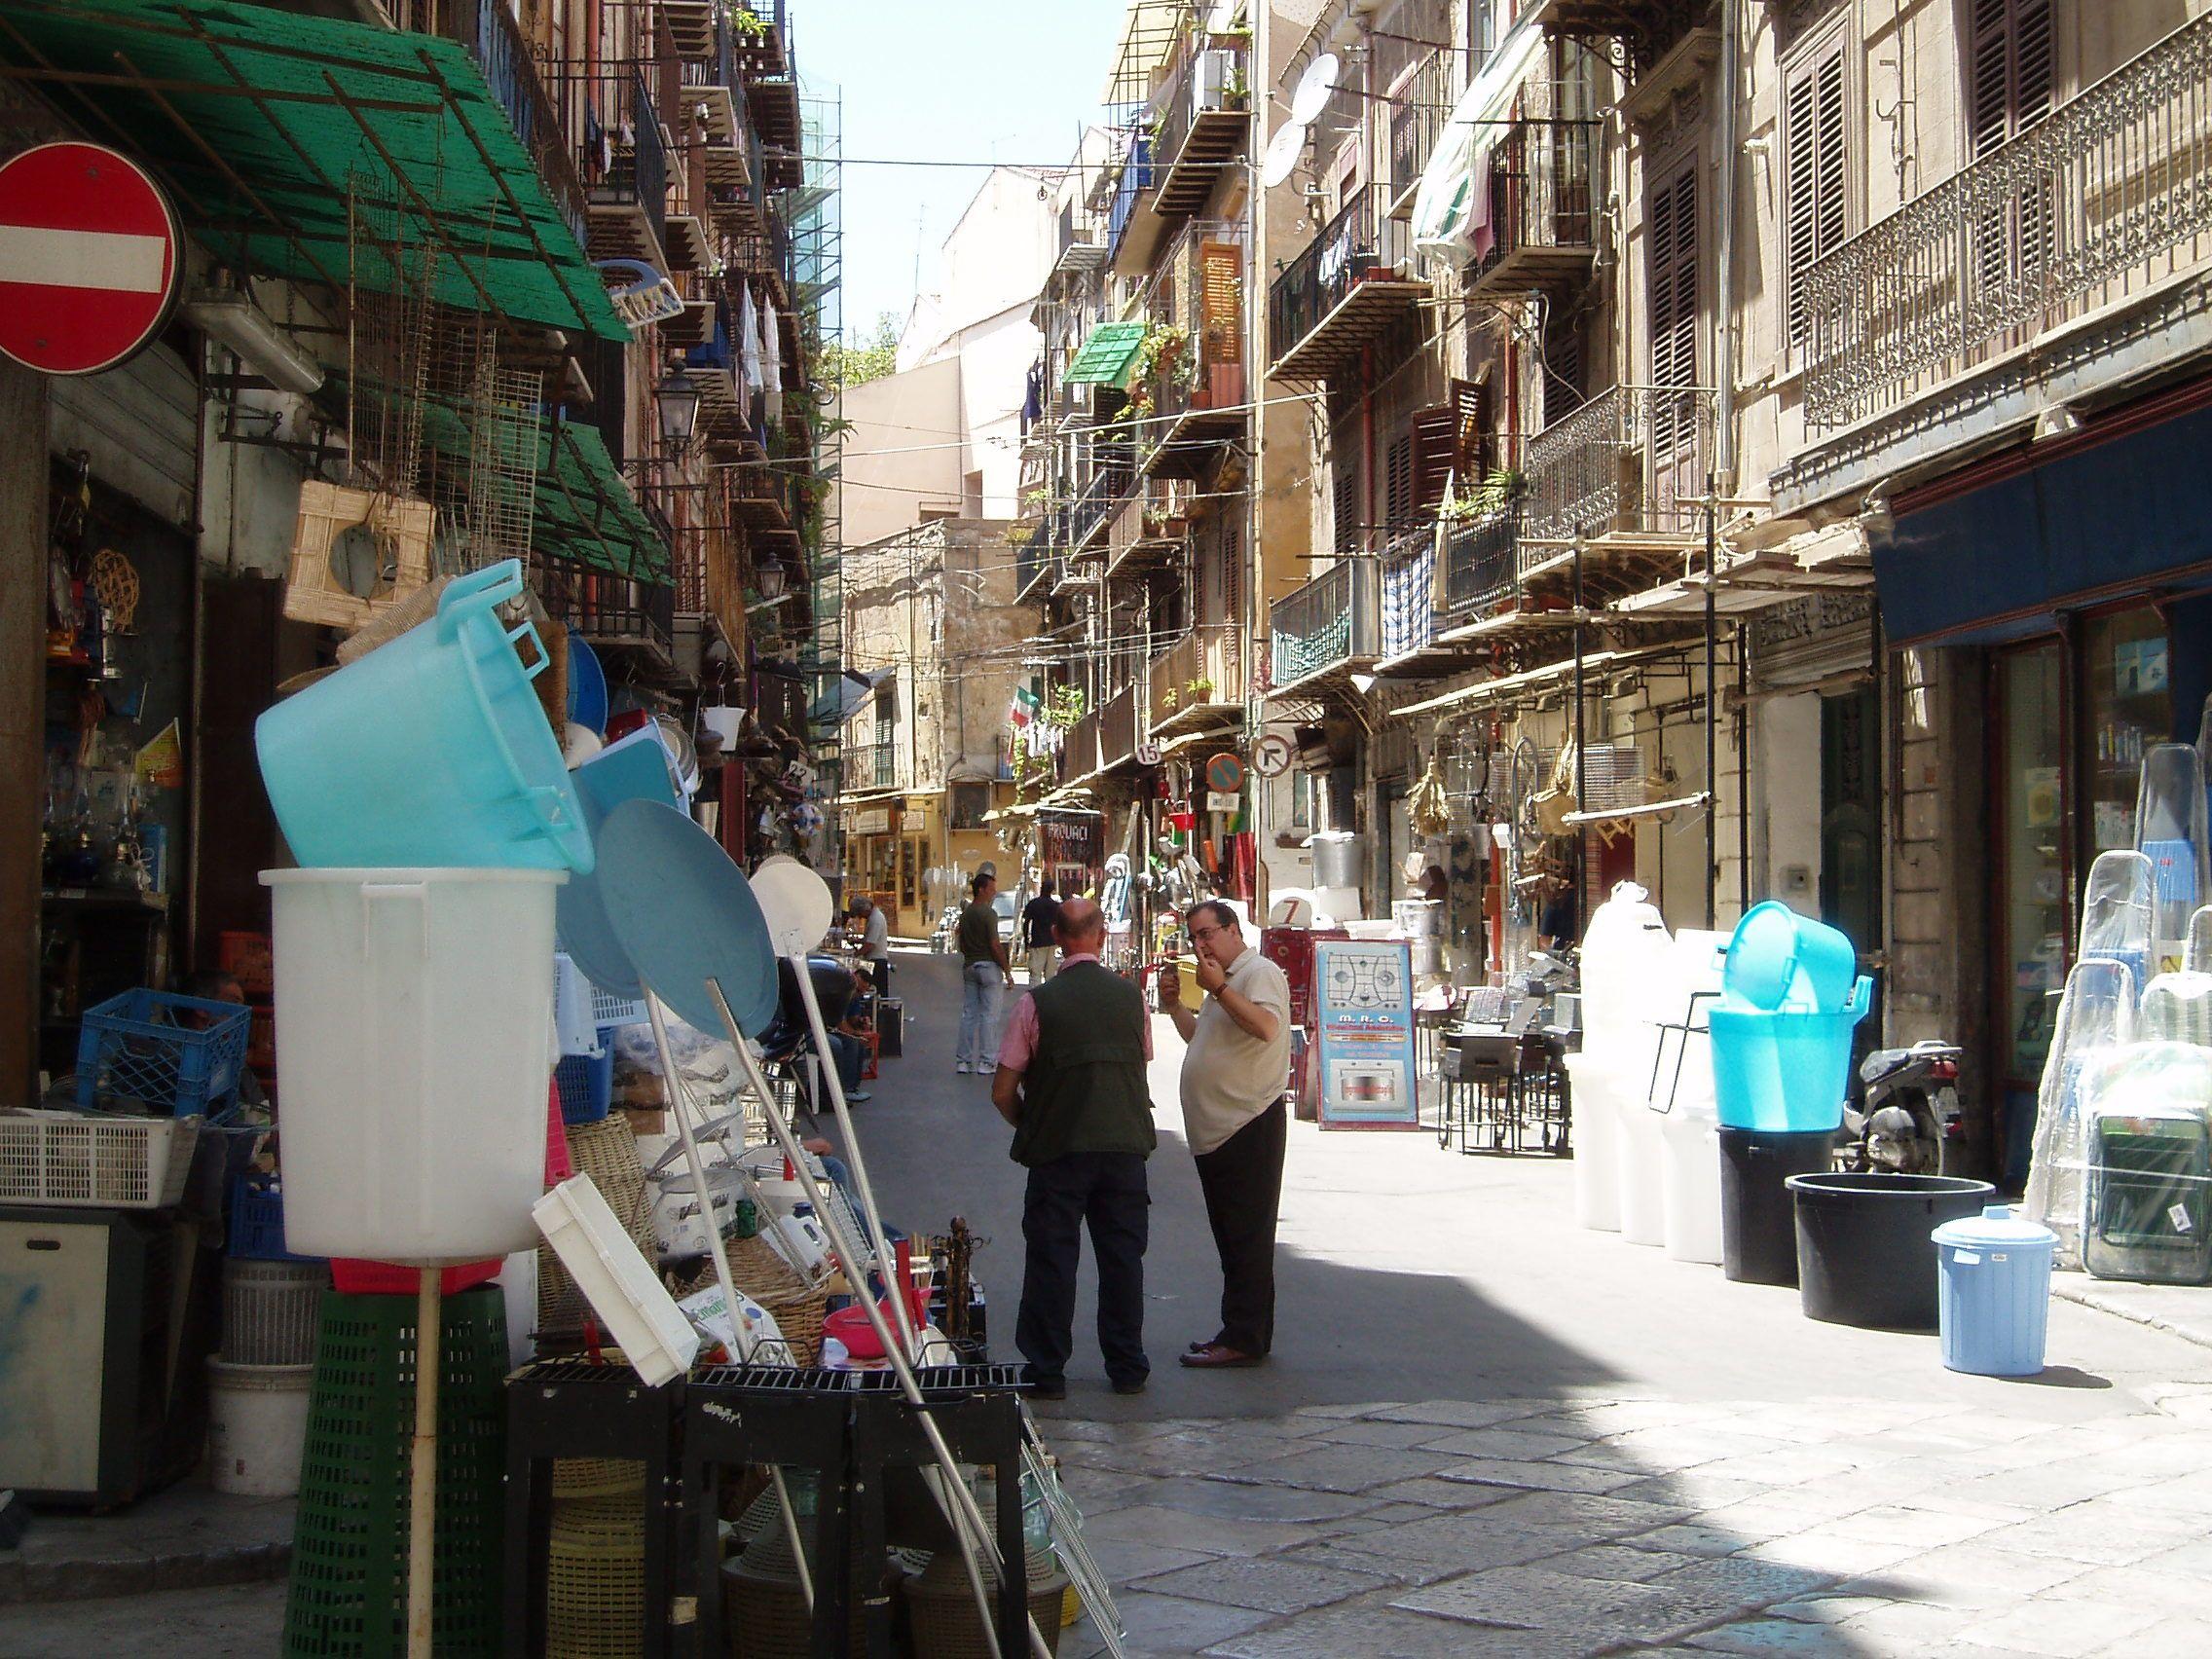 Sicily Palermo u2013 Markets Sicily Palermo